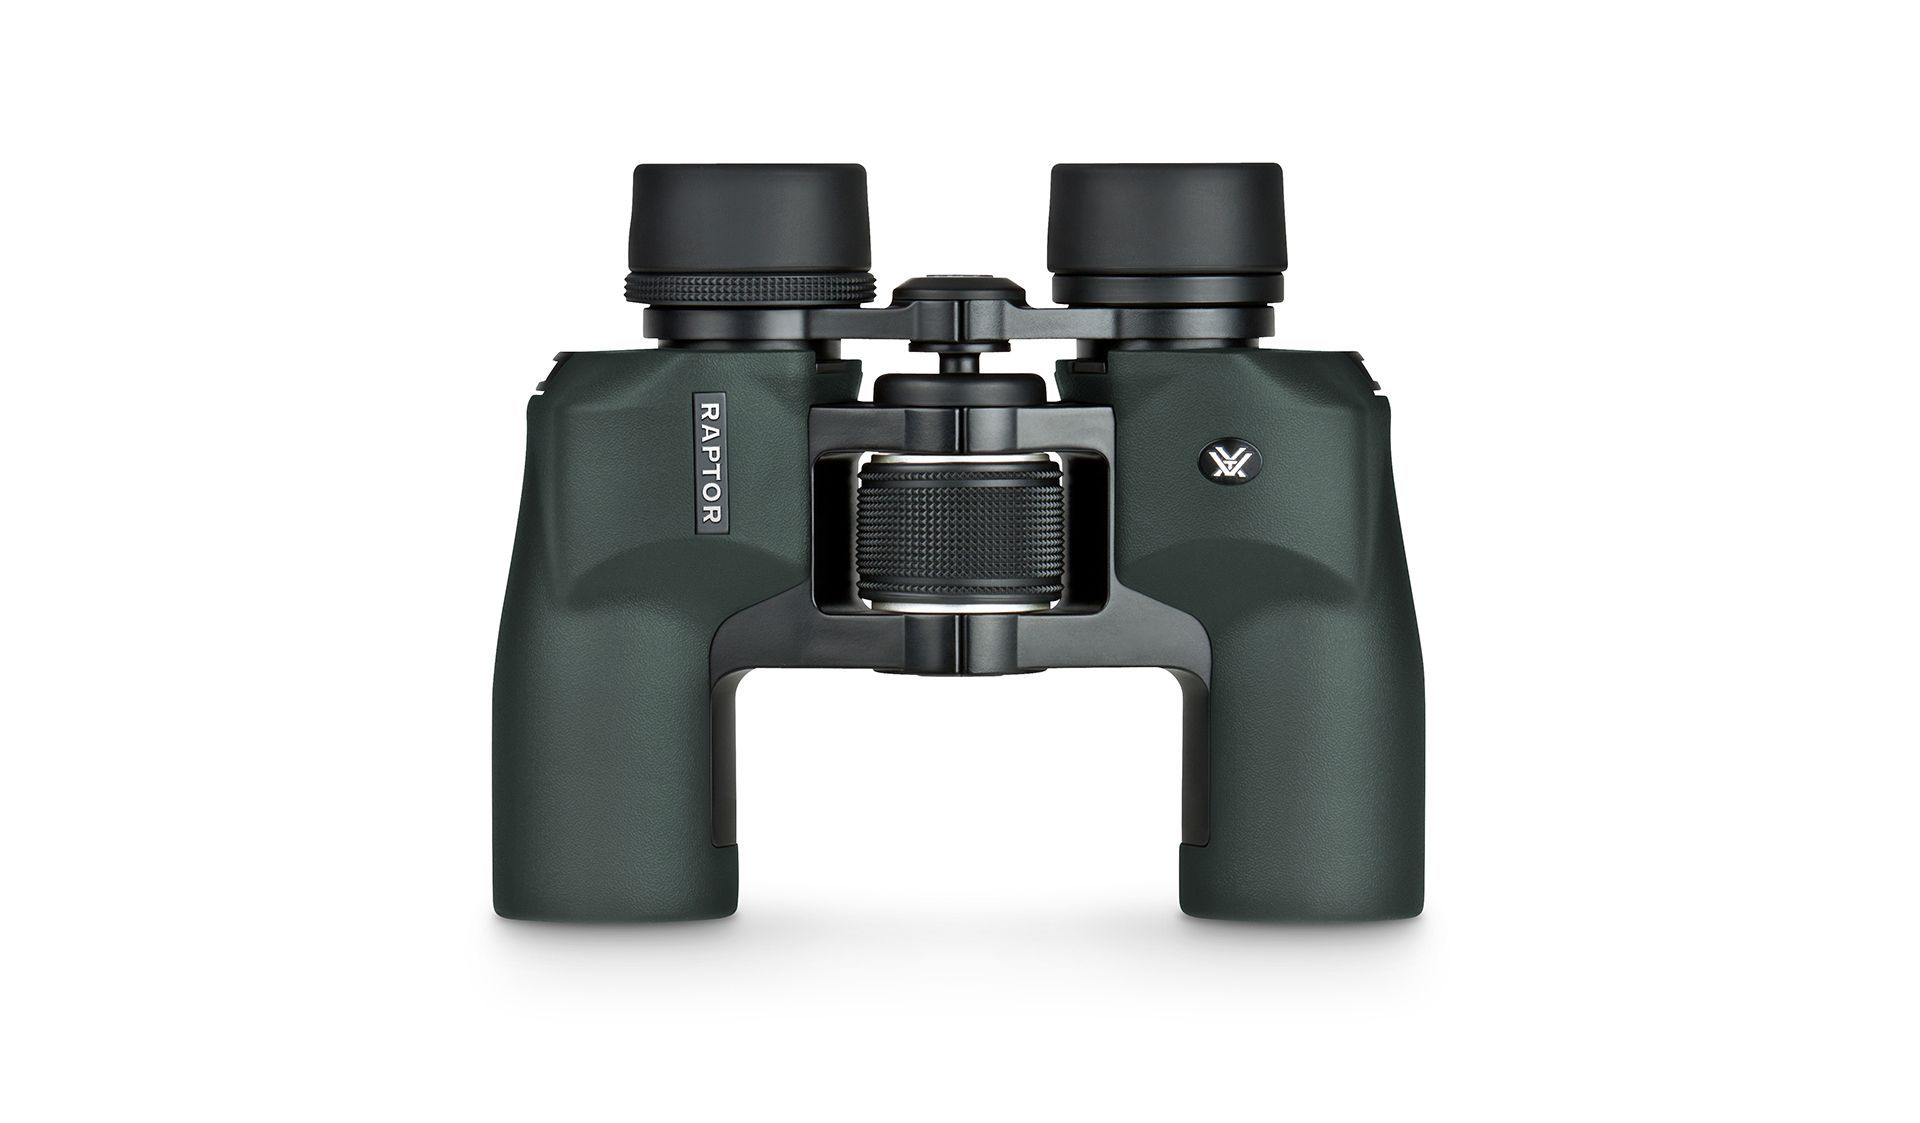 Vortex Raptor 8.5x32 Binoculars R-385 - Australian Tactical Precision